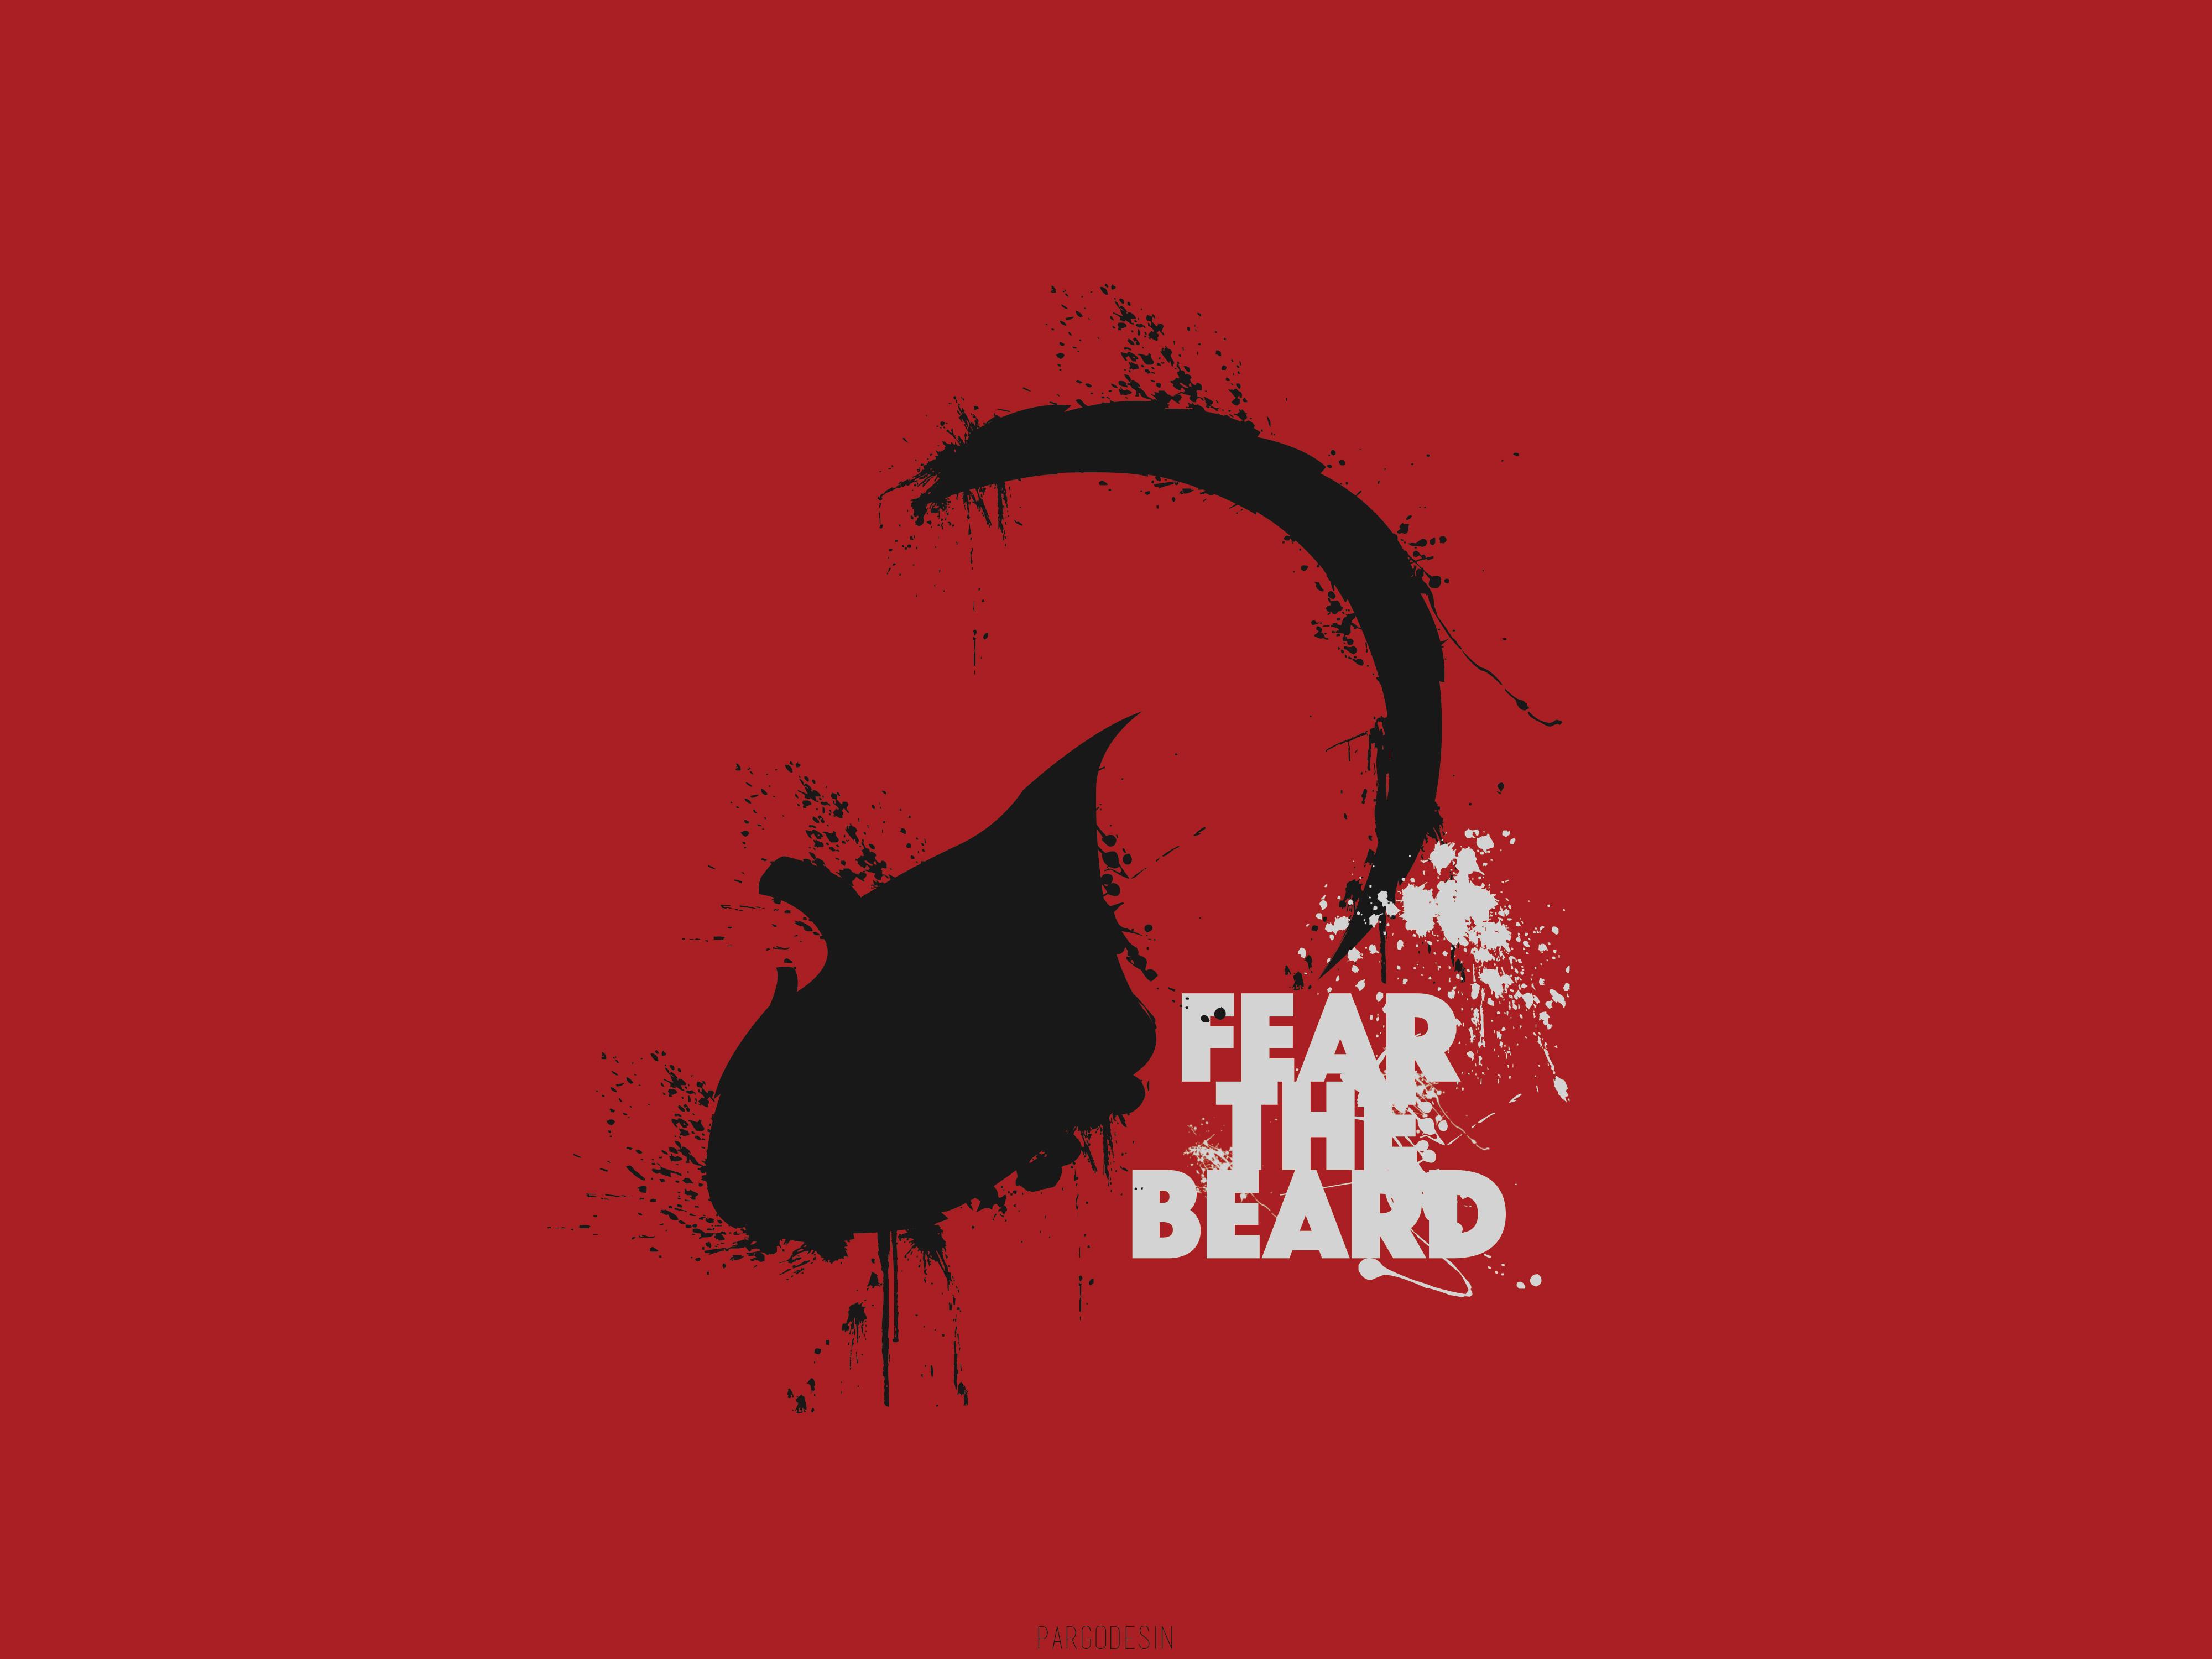 FEAR THE BEARD James Harden by PARGOdesign 4000x3000